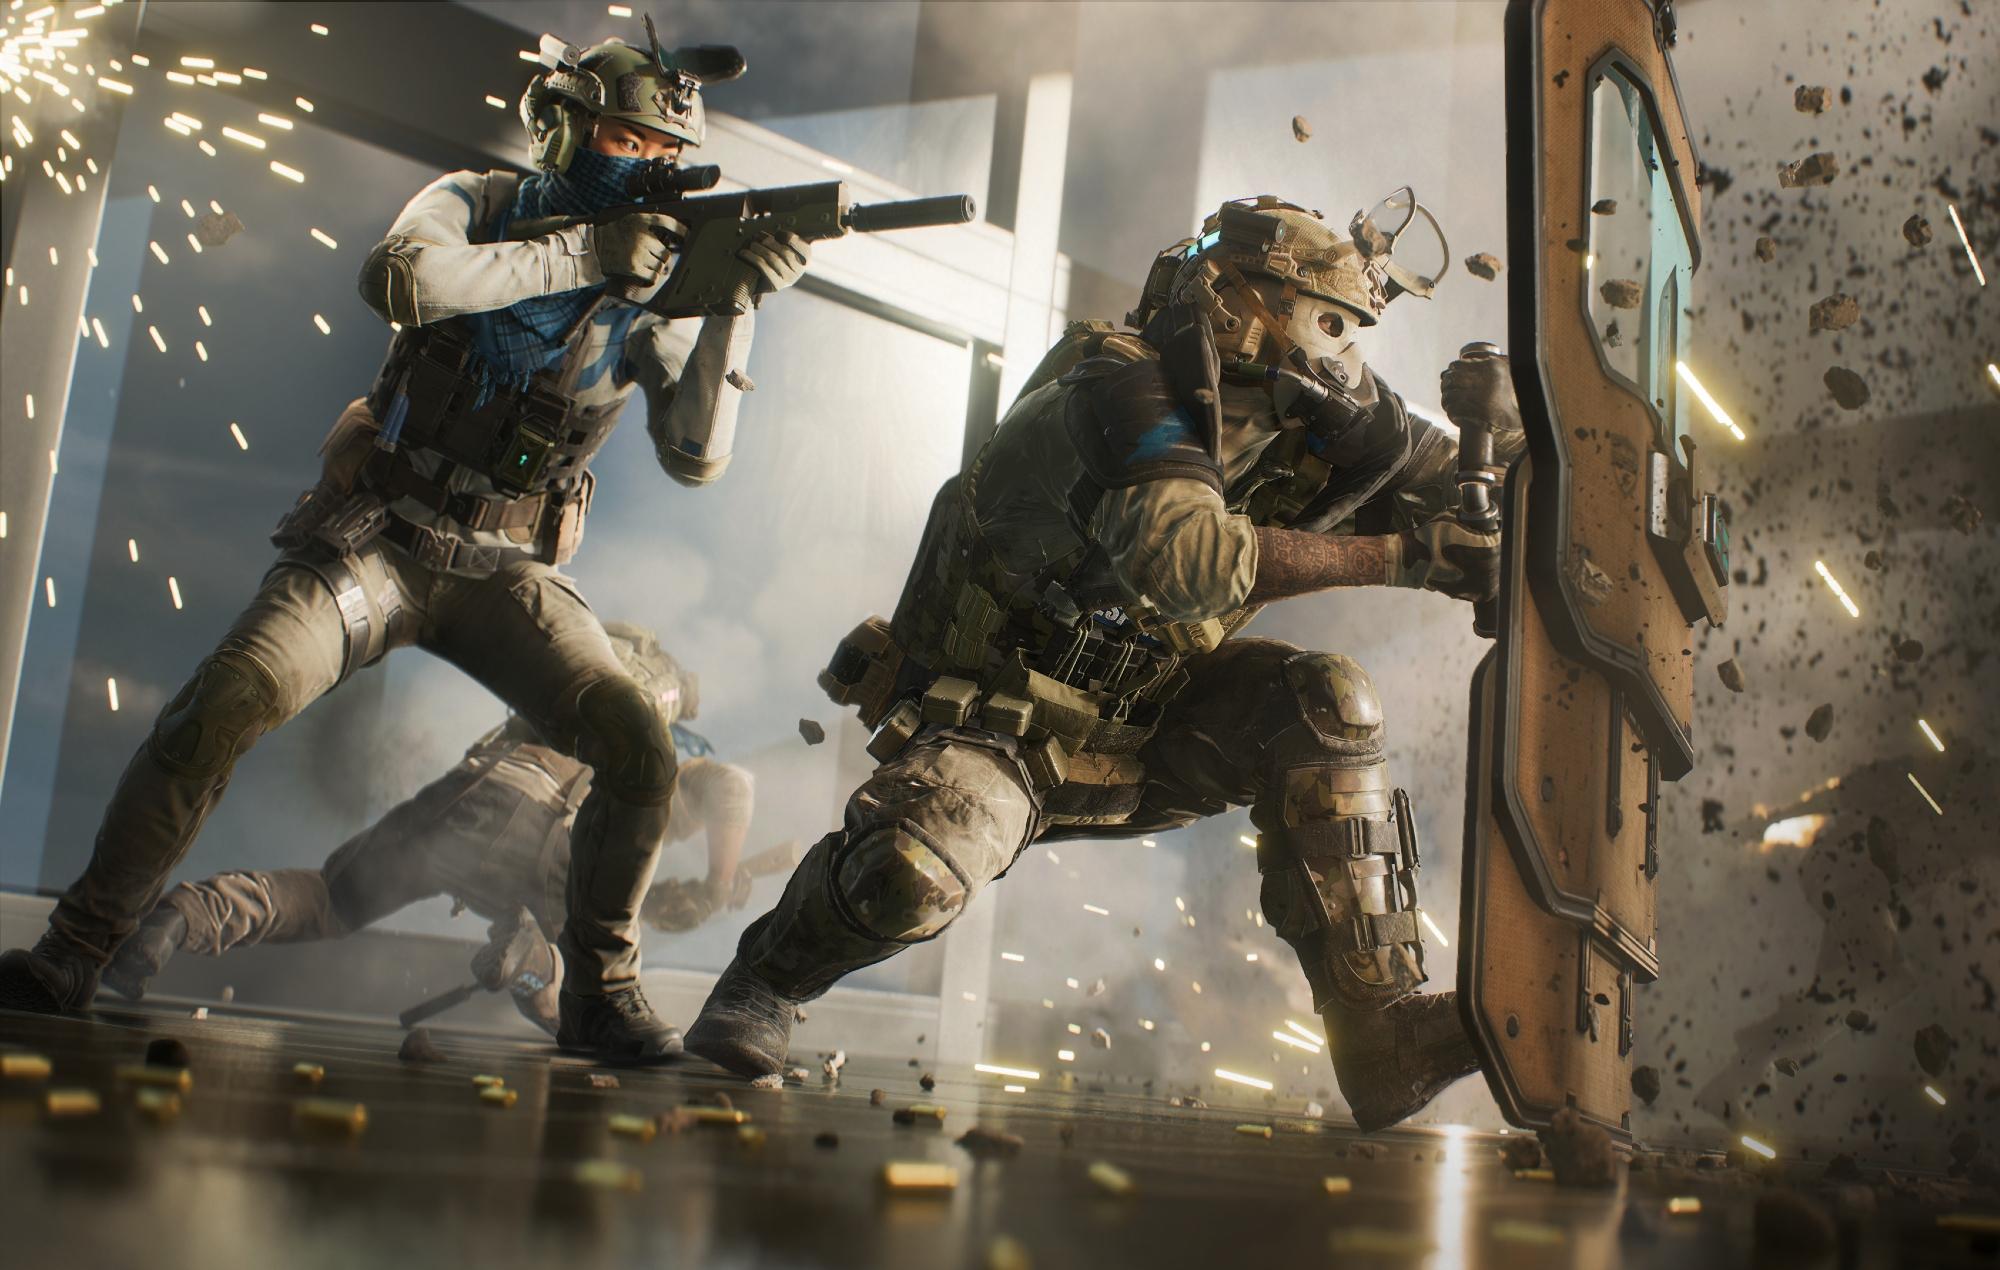 Battlefield 2042 hazard mode fight